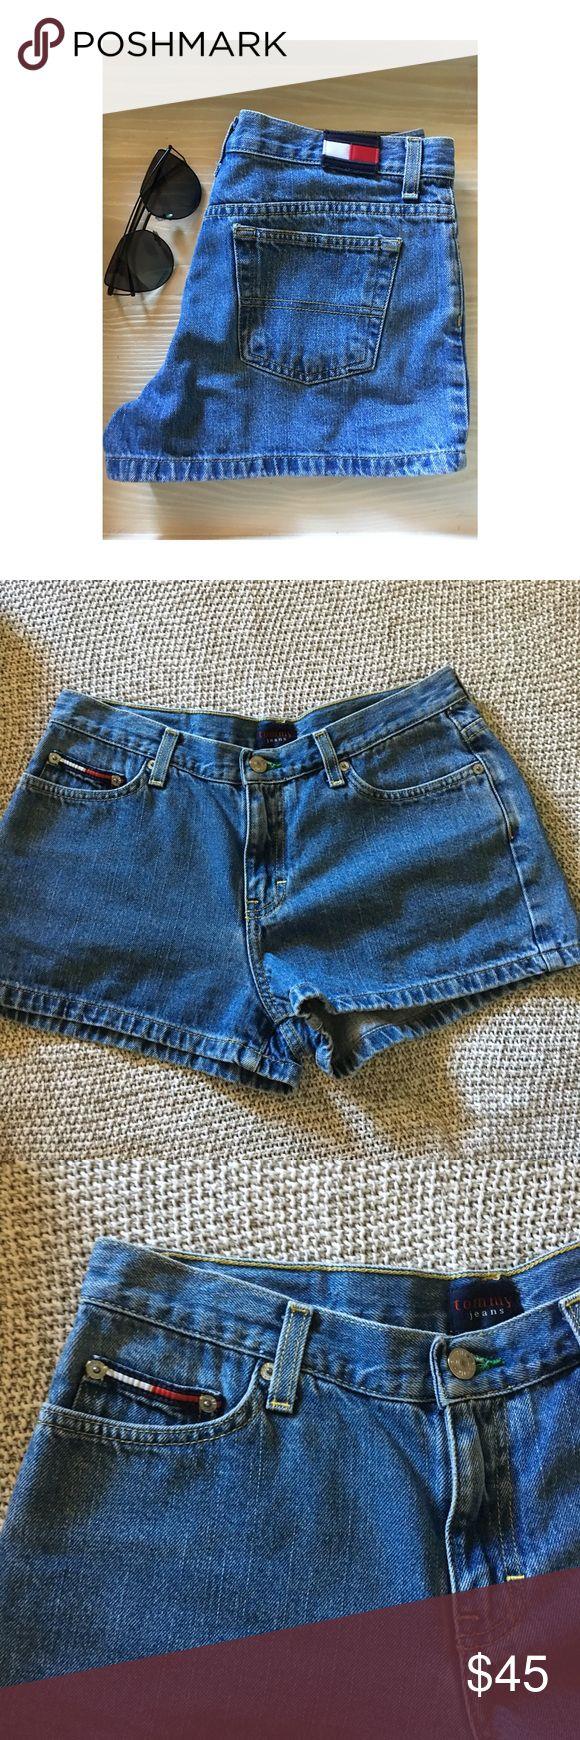 Vintage Tommy Hilfiger Shorts Vintage Tommy Hilfiger Jean shorts. High waisted. Great condition. Size 9. Tommy Hilfiger Shorts Jean Shorts